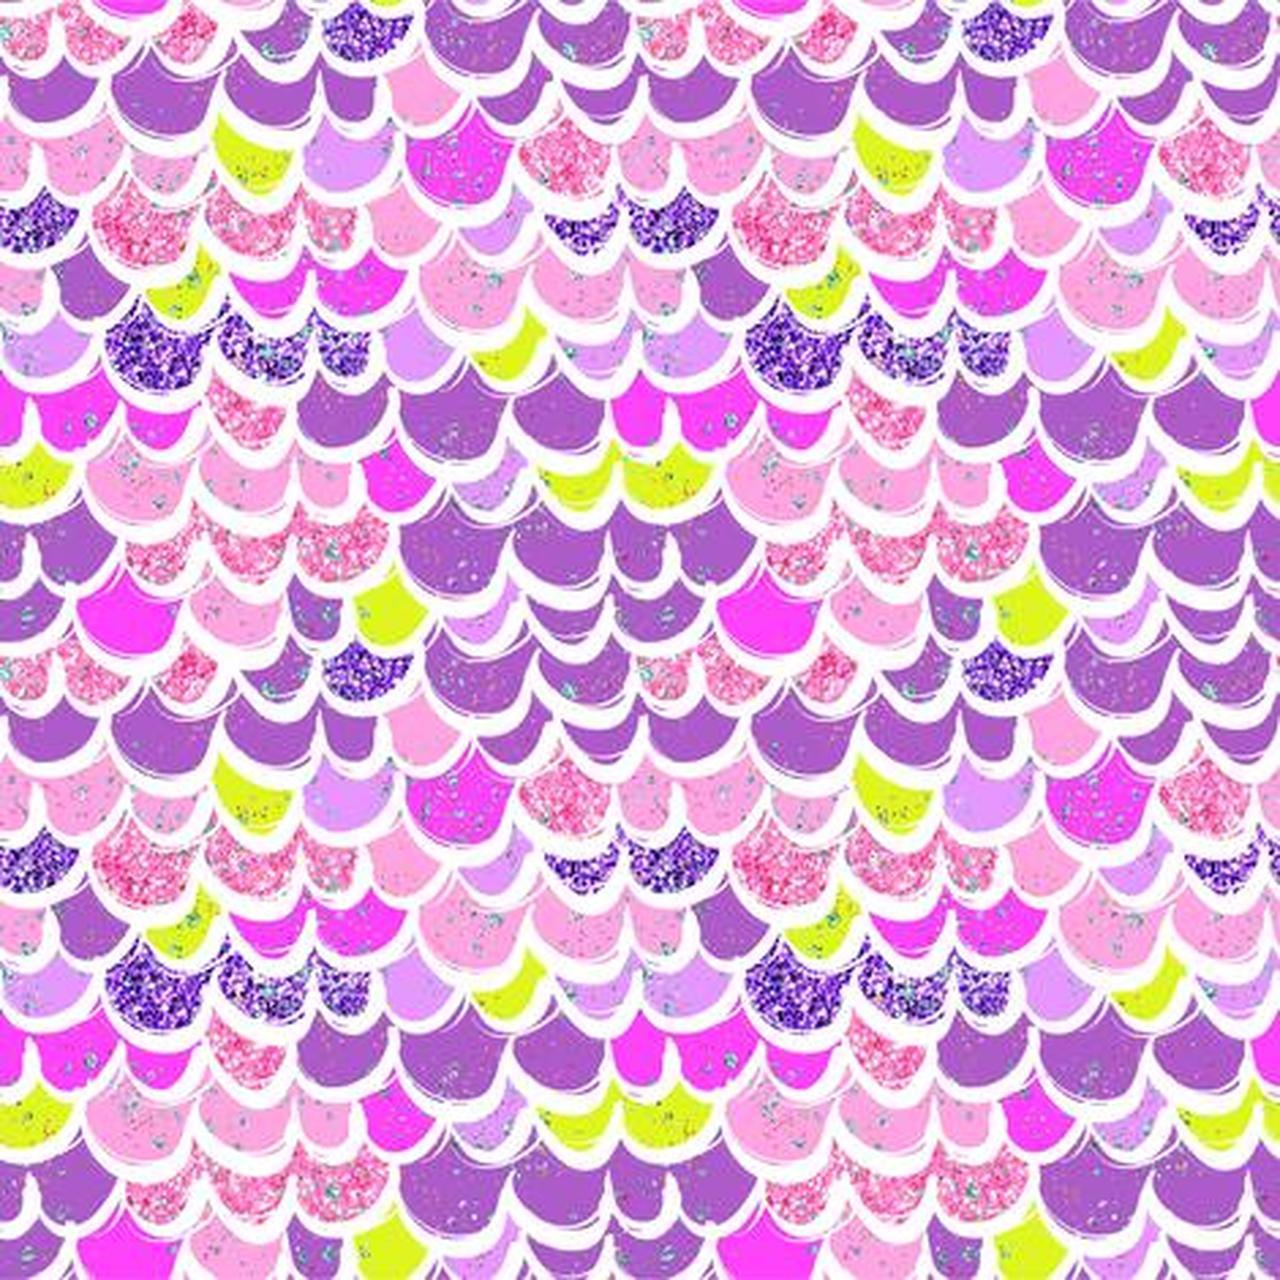 Oeko tex logo clipart vector stock Mermaid Scales Purple/Pink/Yellow-green Euro Oeko-Tex Knit - 1/2 yard vector stock